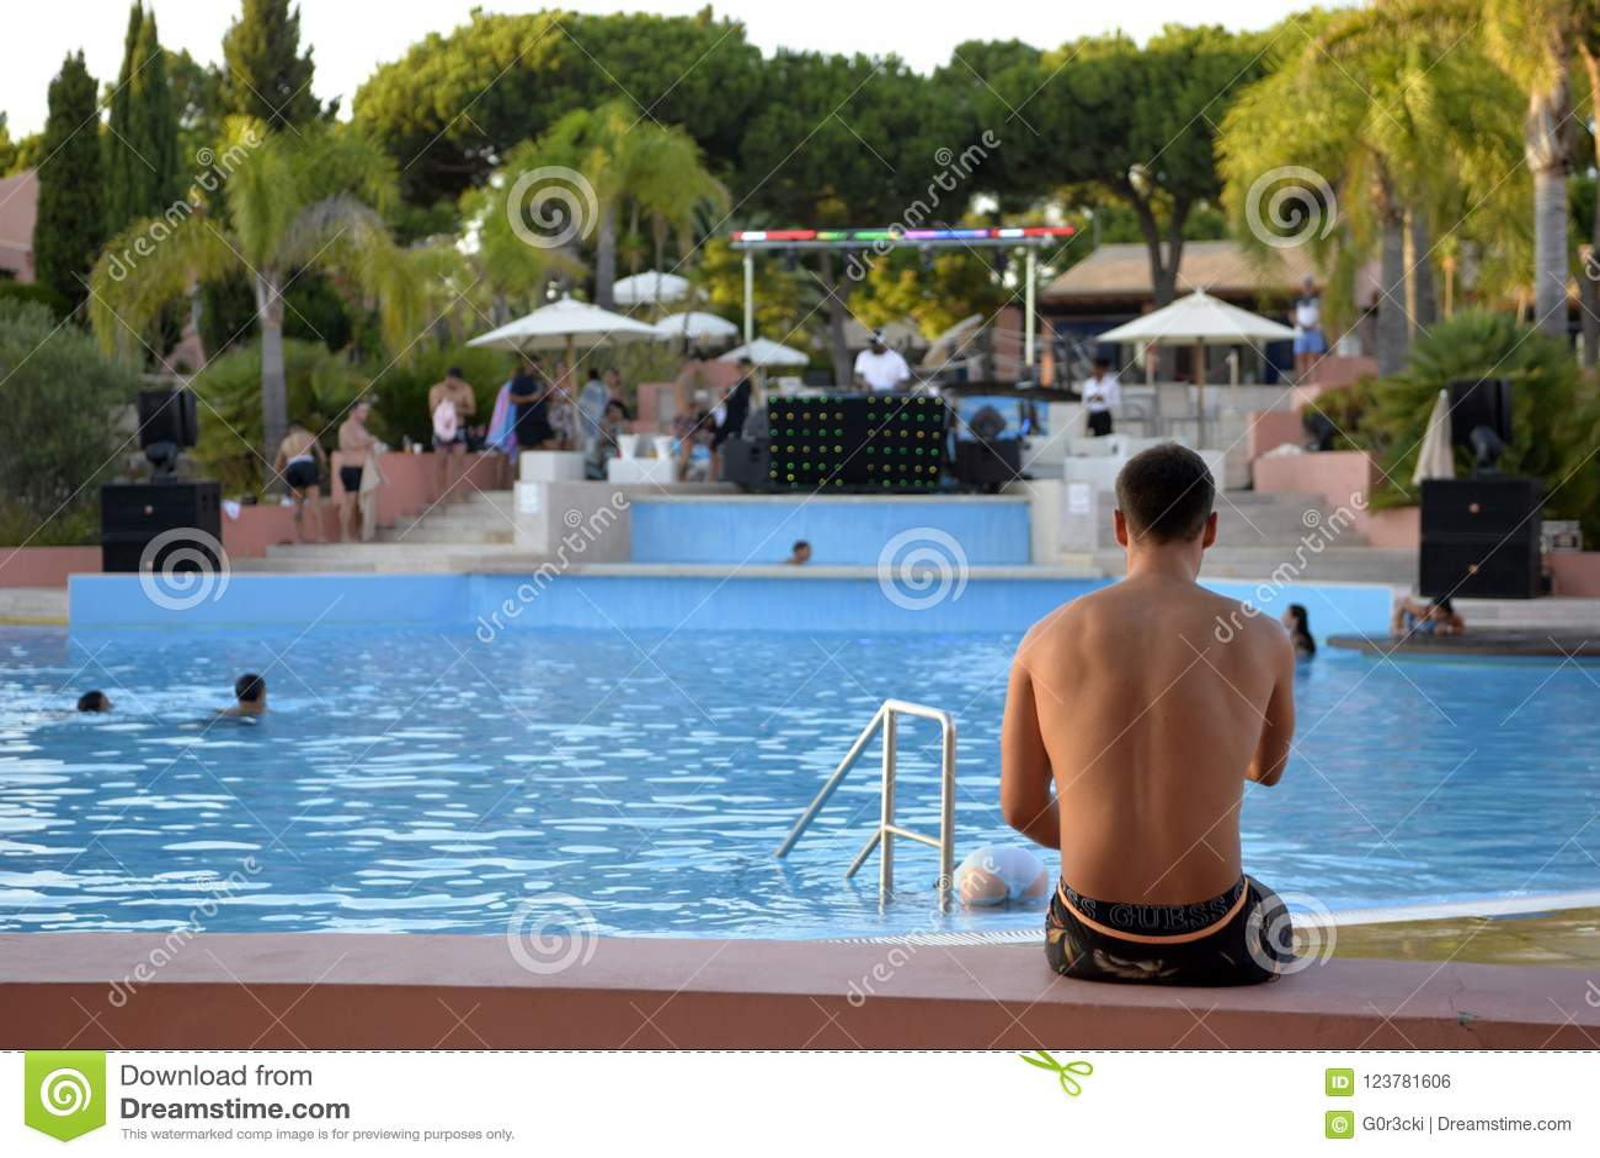 Pool Summer Party, Music DJ, Summer Holidays, Travel